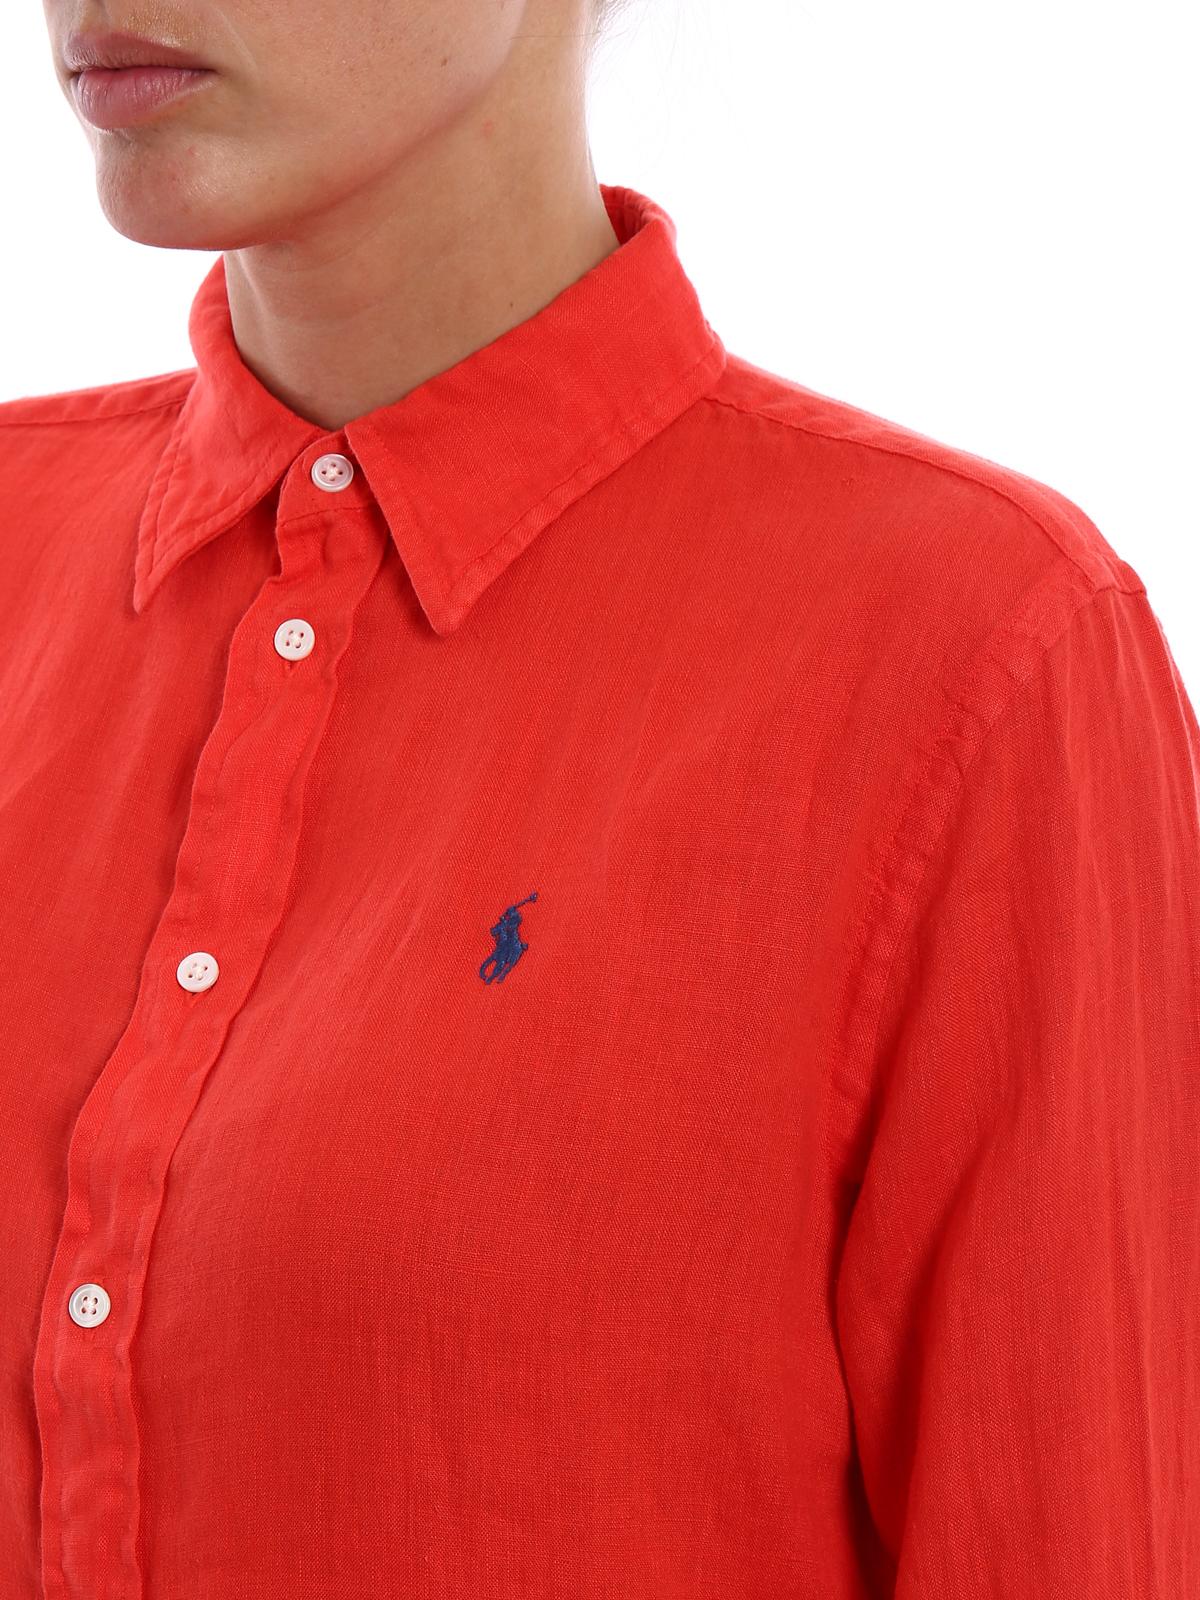 sports shoes b3470 cc4d9 Polo Ralph Lauren - Camicia rossa in lino - camicie ...